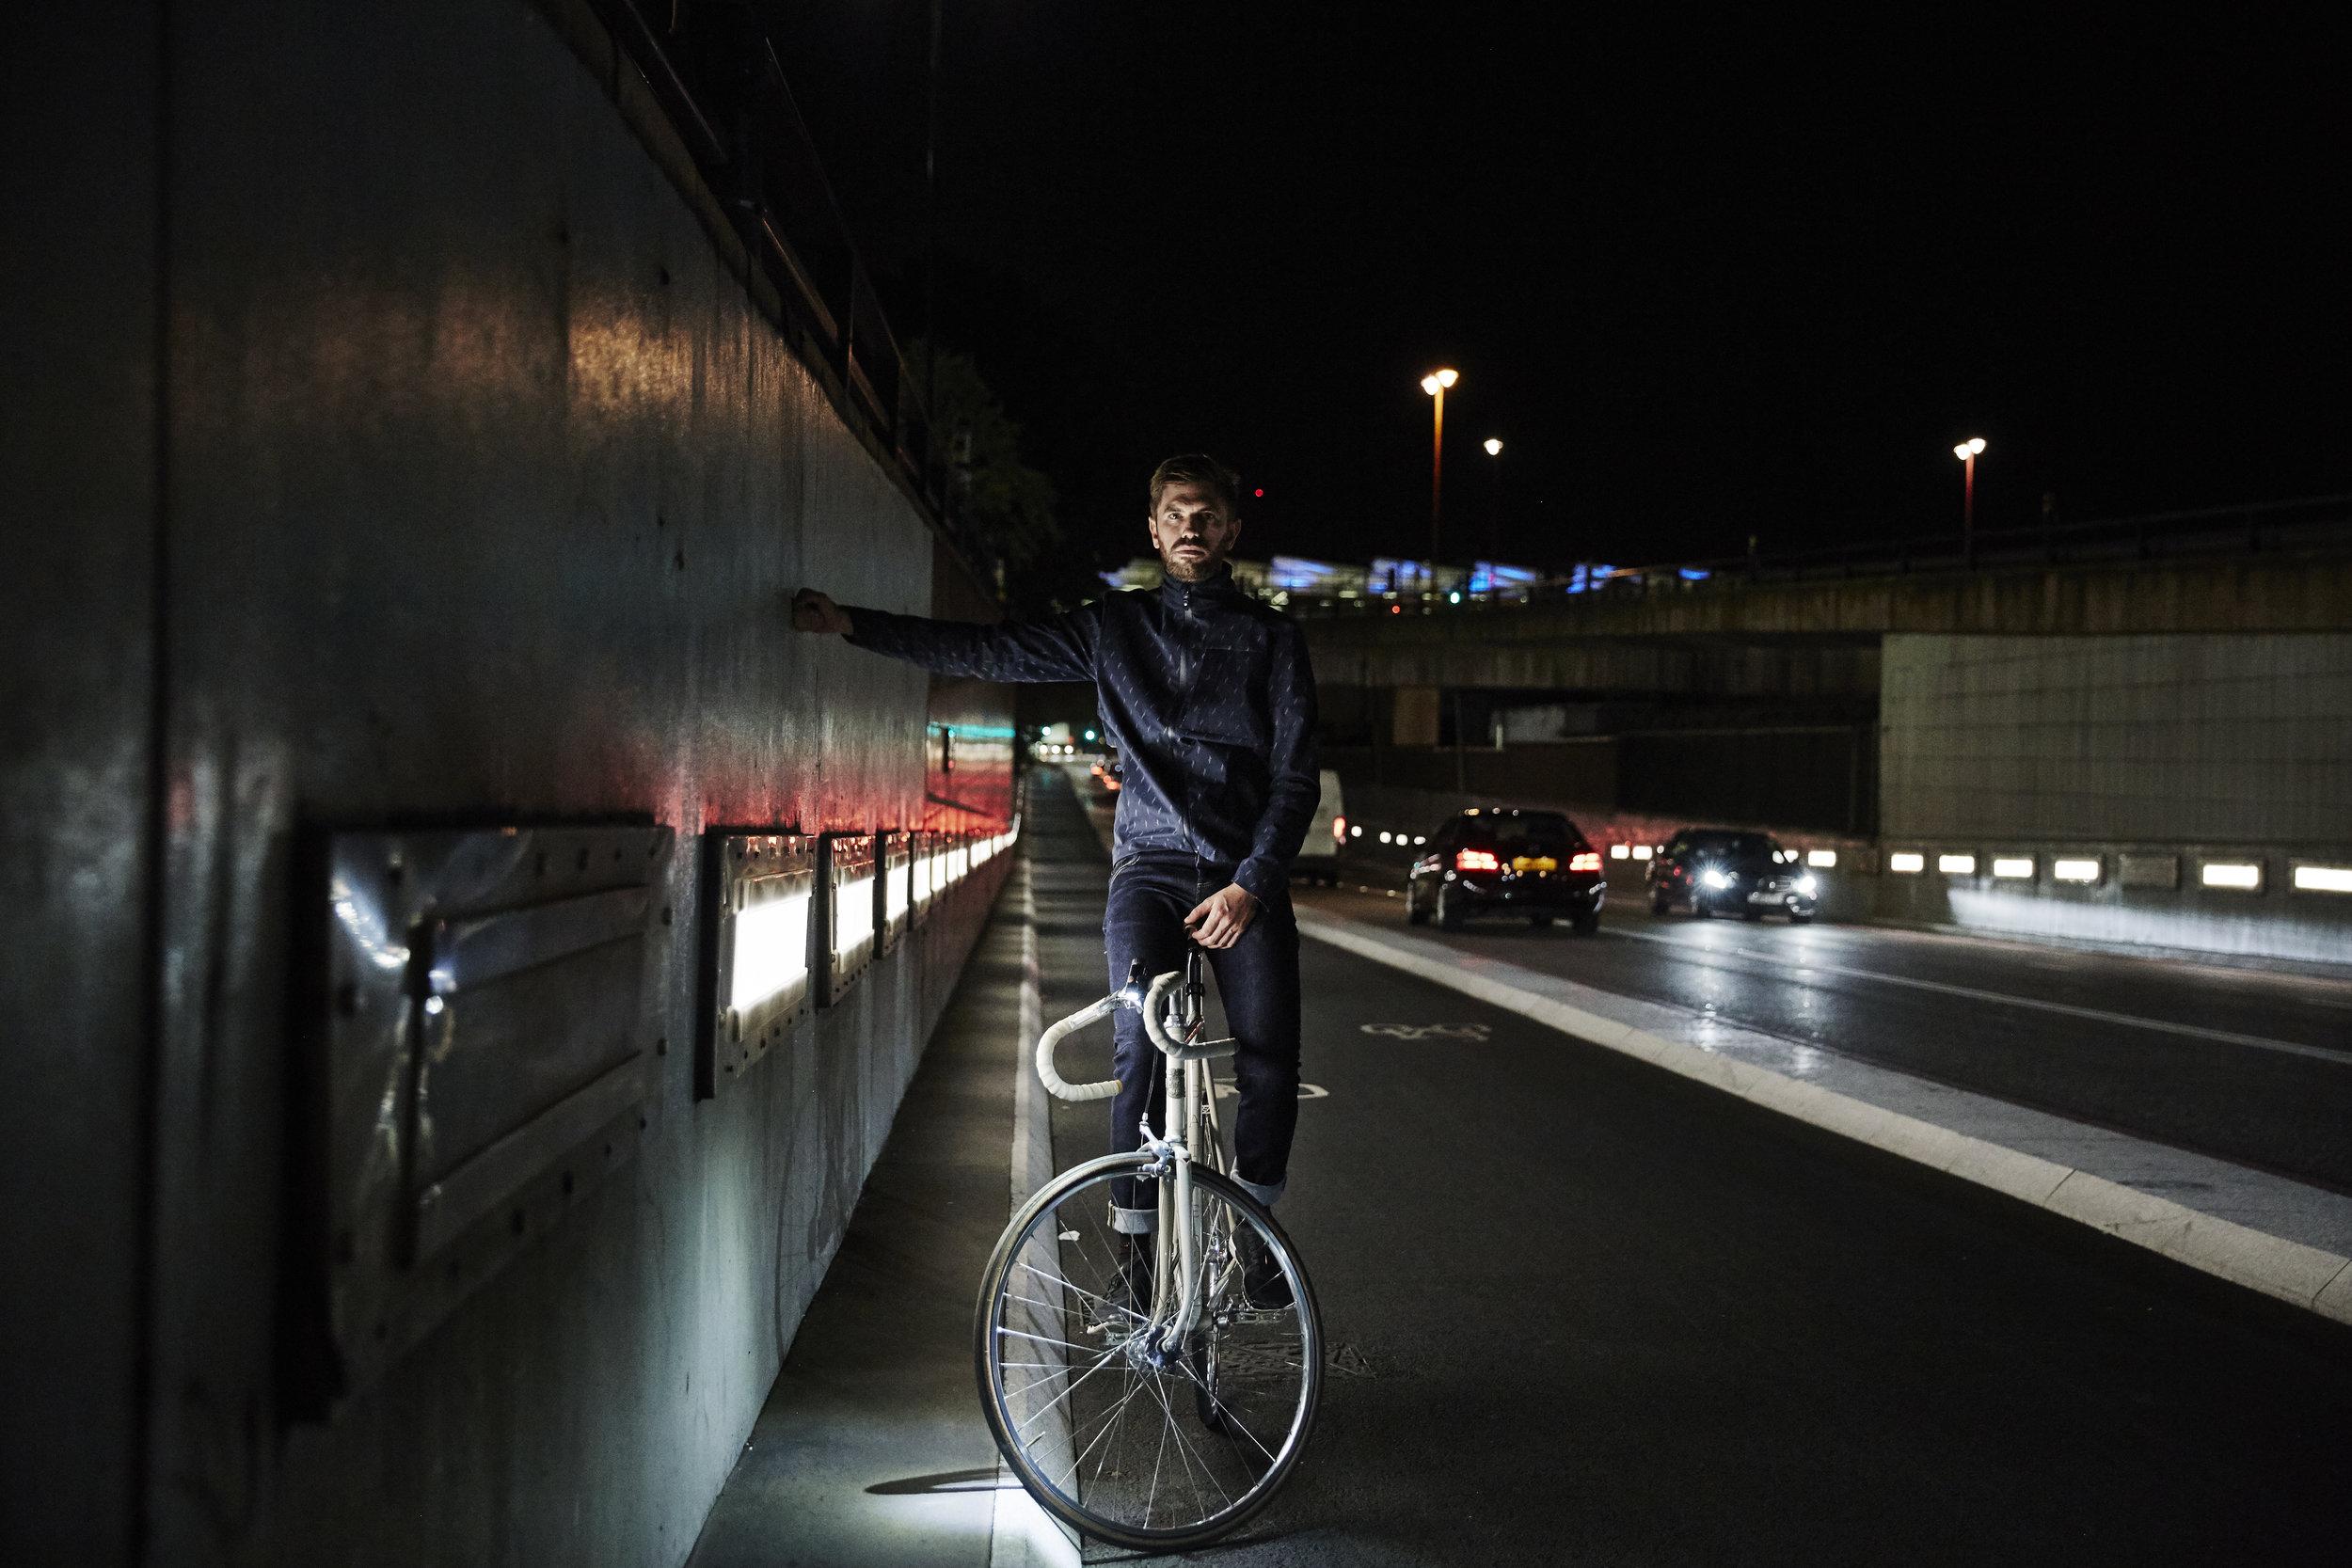 vulpine nick hussey cycling style night dark.jpg